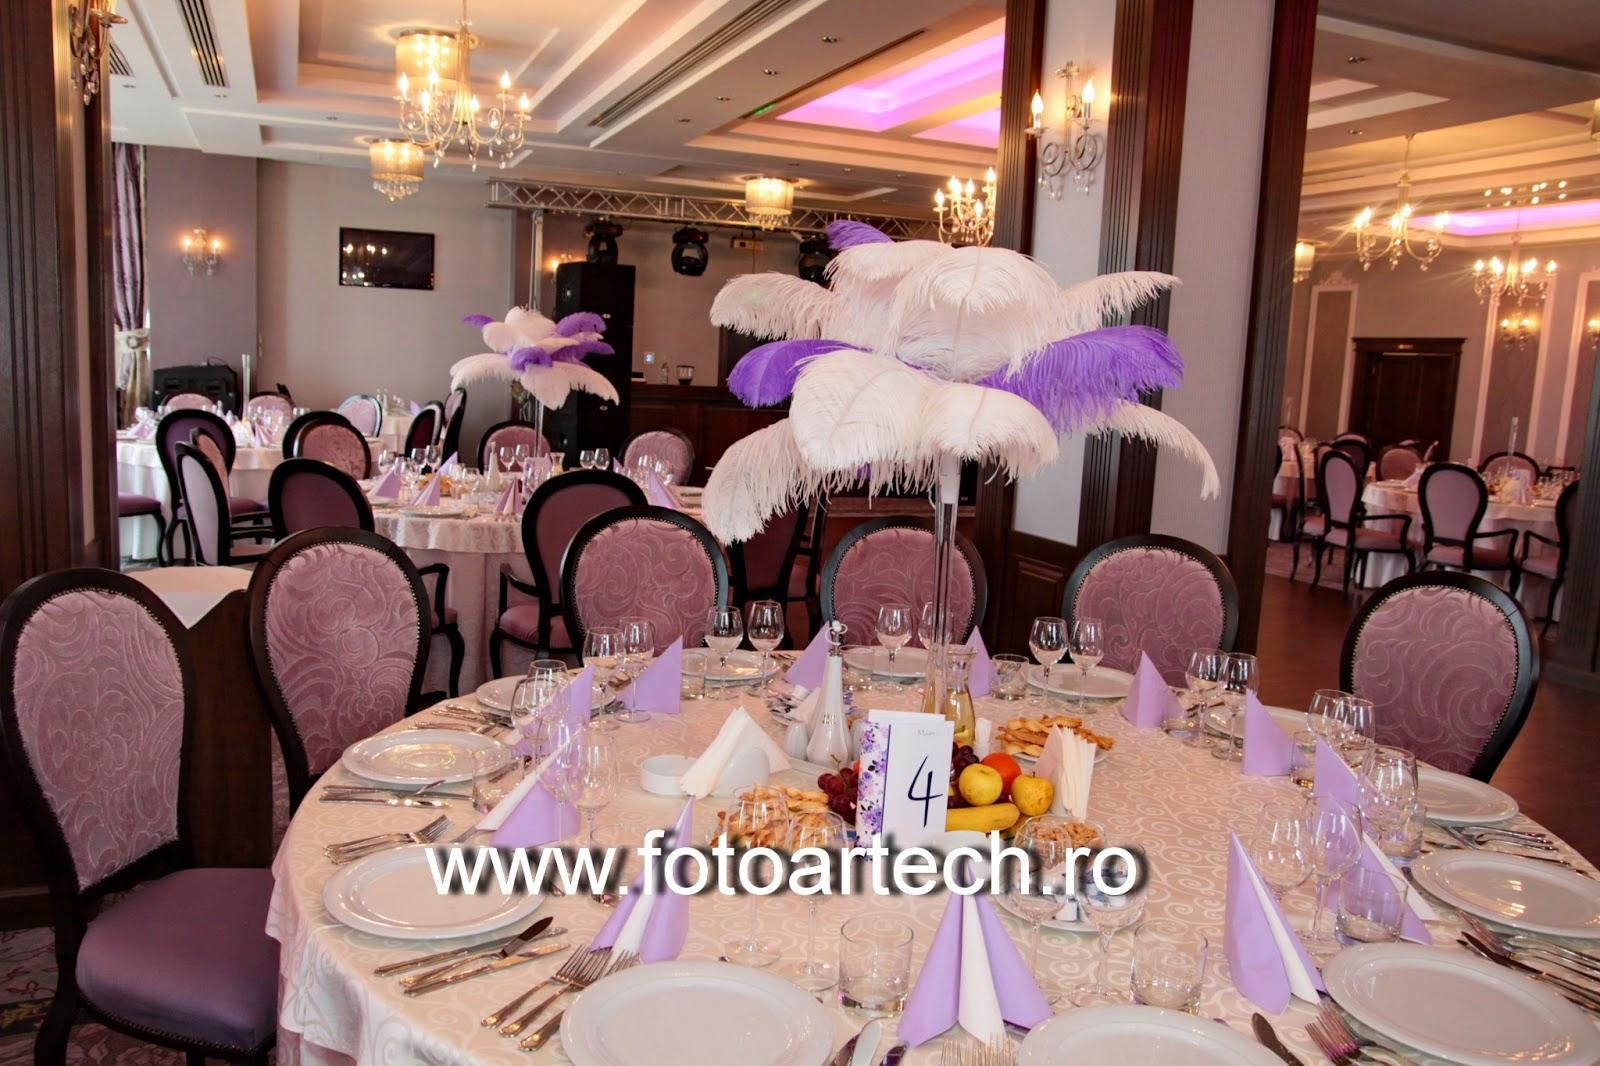 Fotoartech Restaurant Select